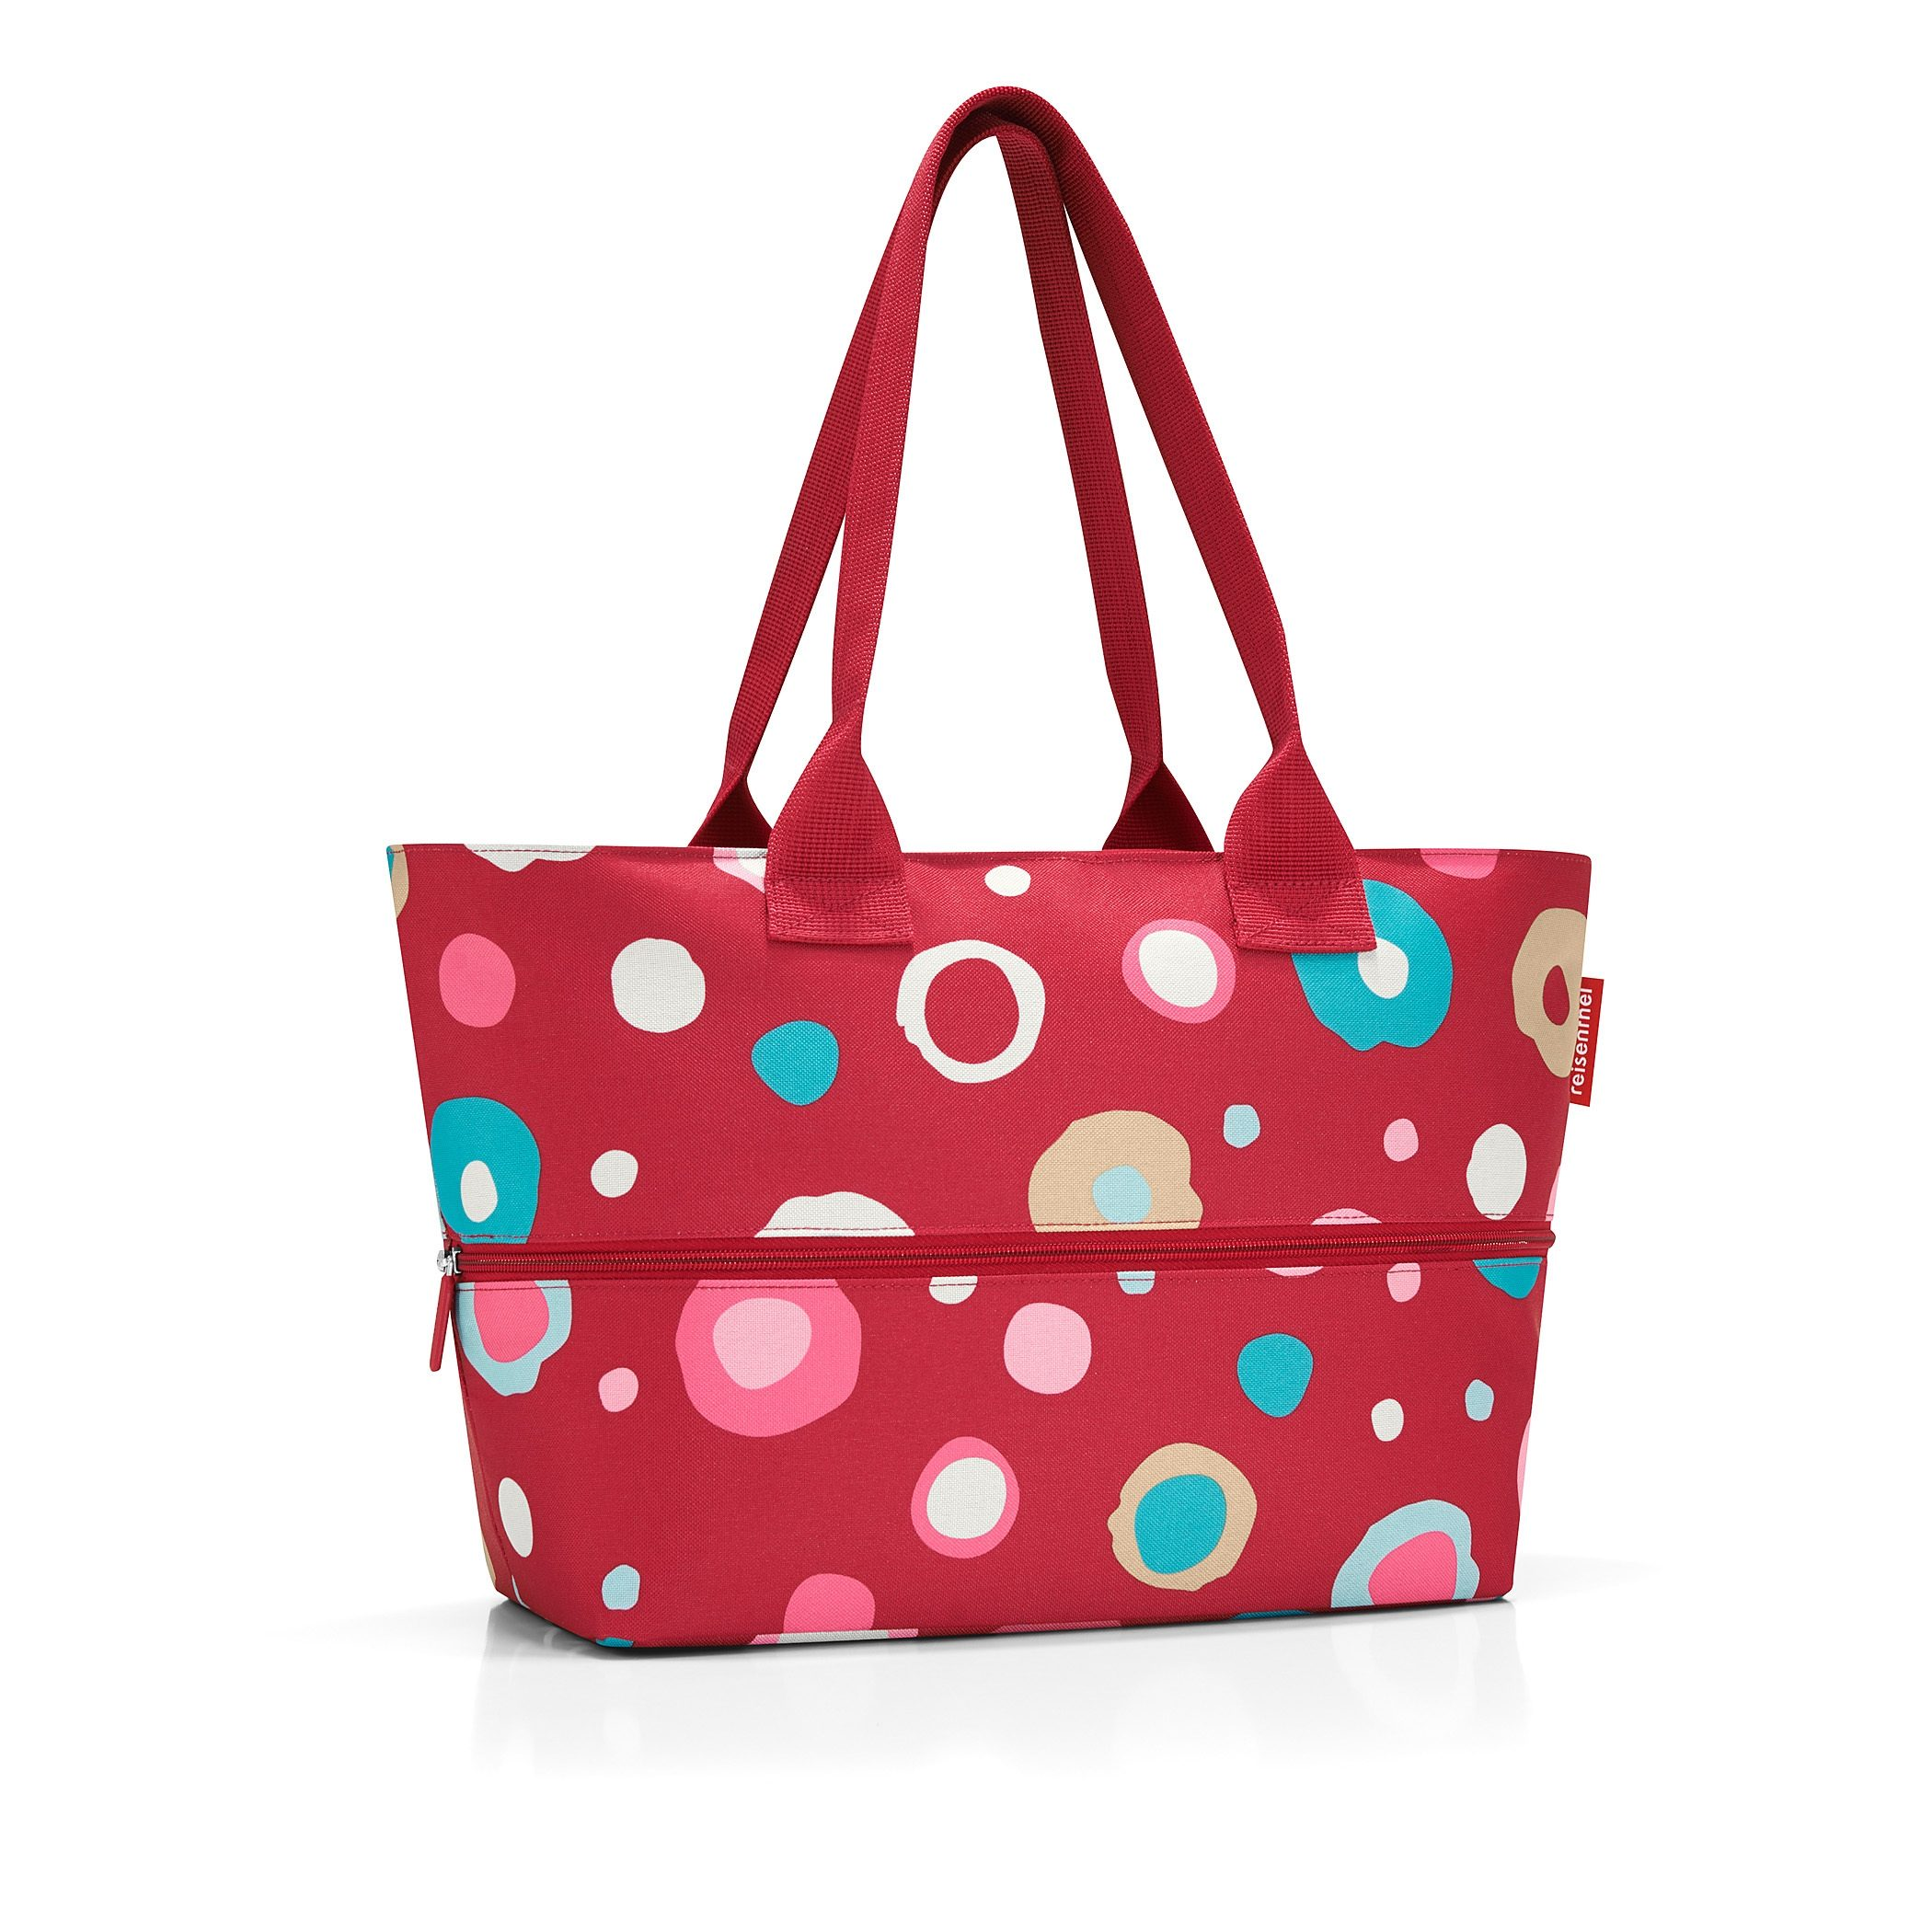 REISENTHEL® Shopper e1 funky dots 2